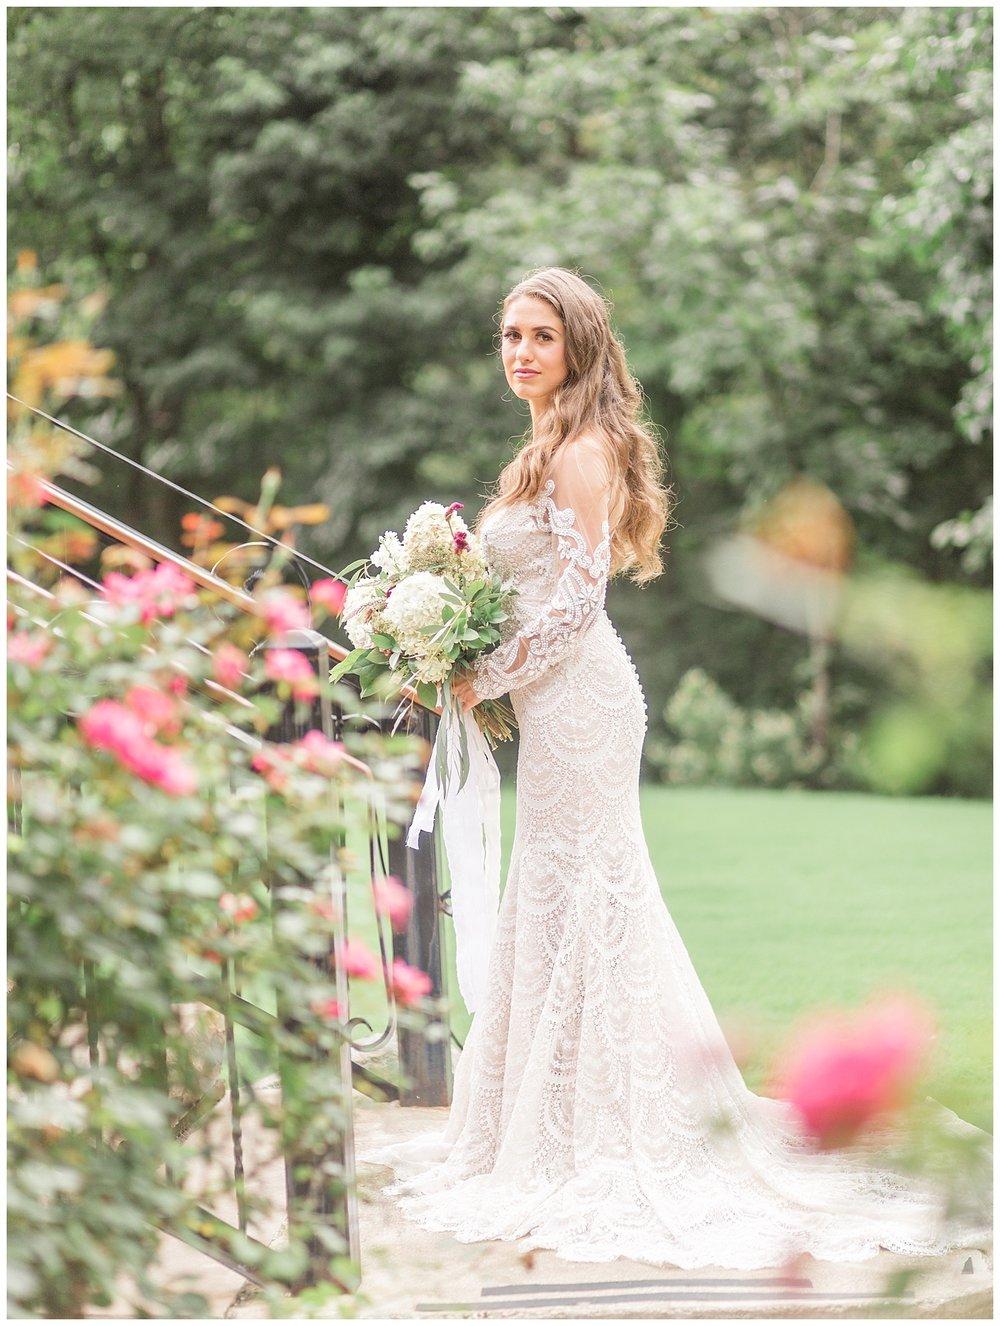 Ashton Creek Vineyard Wedding - Styled Shoot